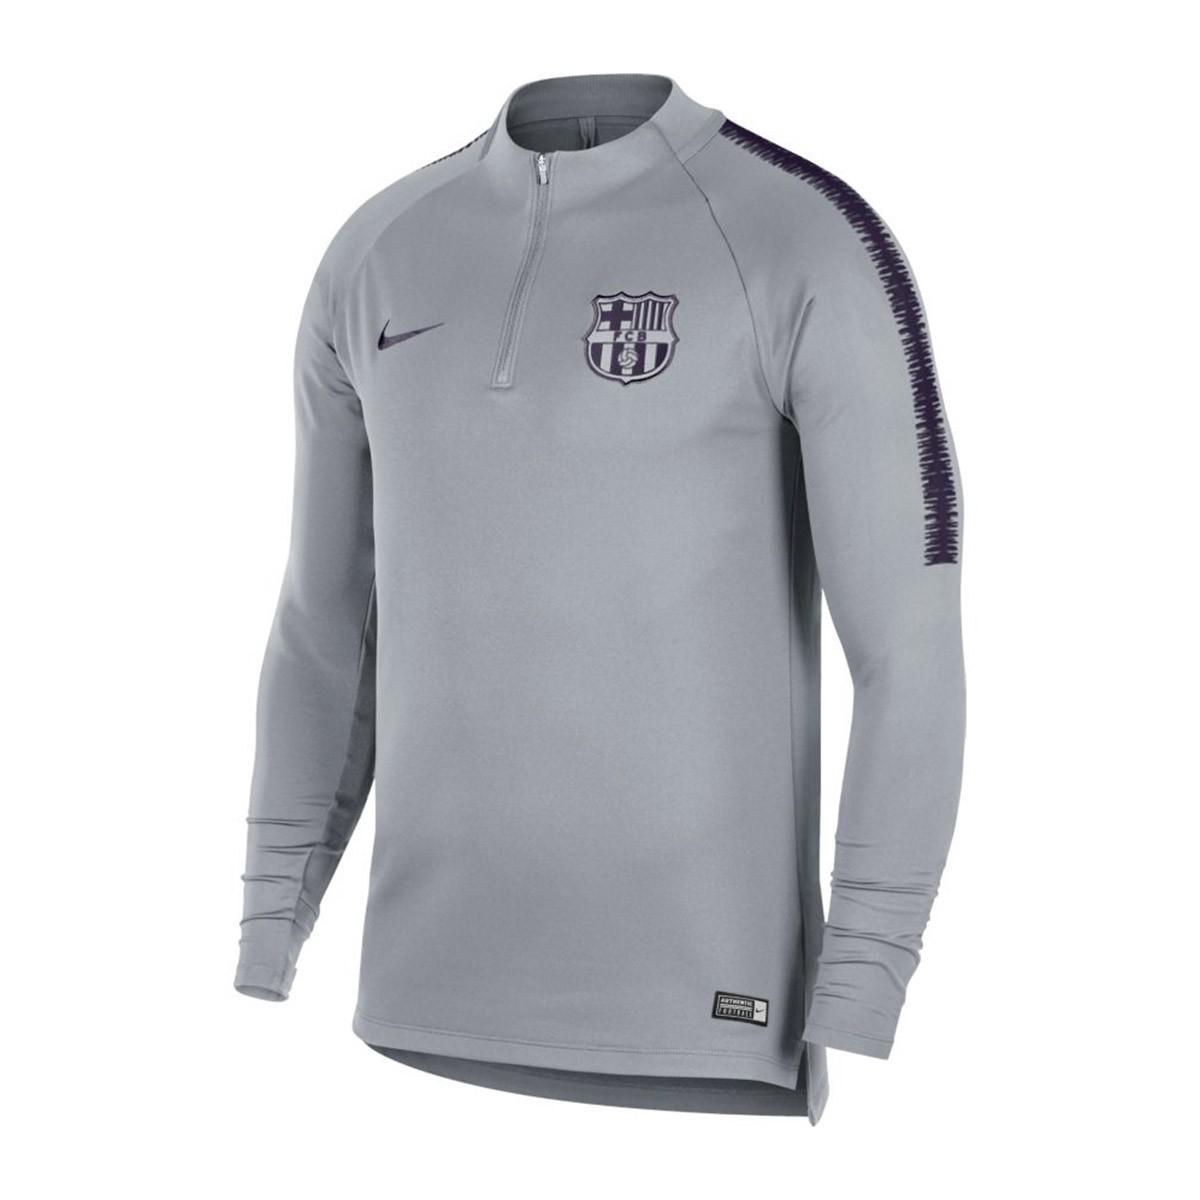 Nike FC Barcelona mikina šedá pánska 2018-2019 a9c2eb78526